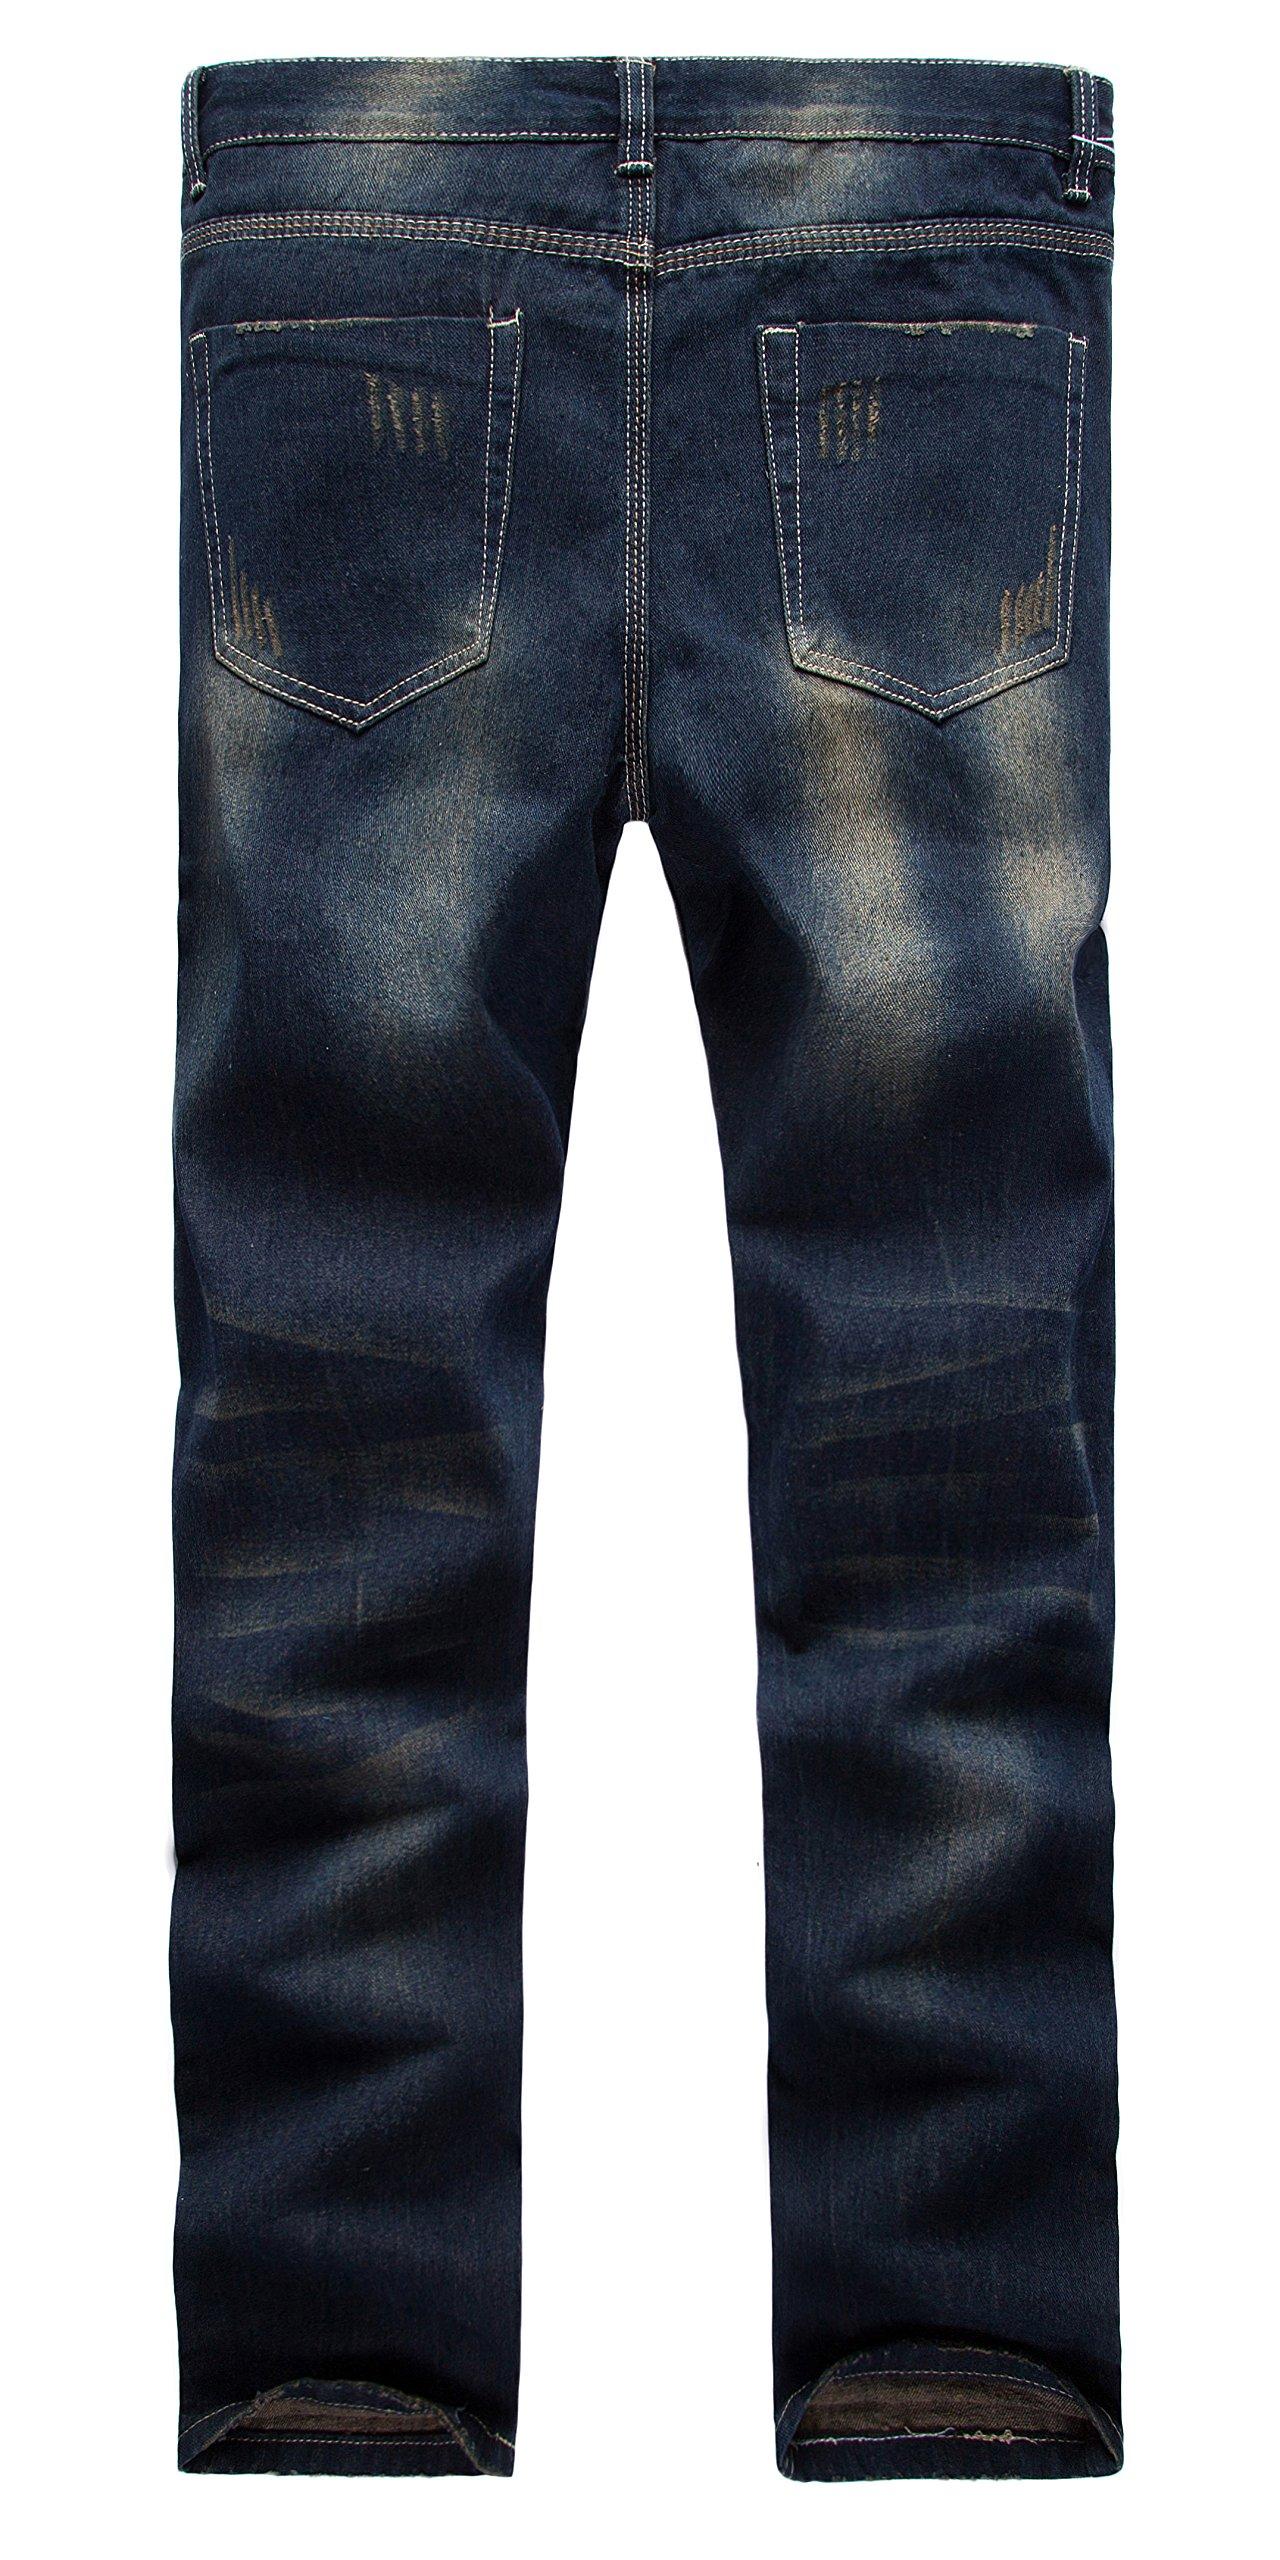 FEESON Men's Straight Leg Slimming Fit Distressed Loose Denim Jeans Dark Blue W30 by FEESON (Image #2)